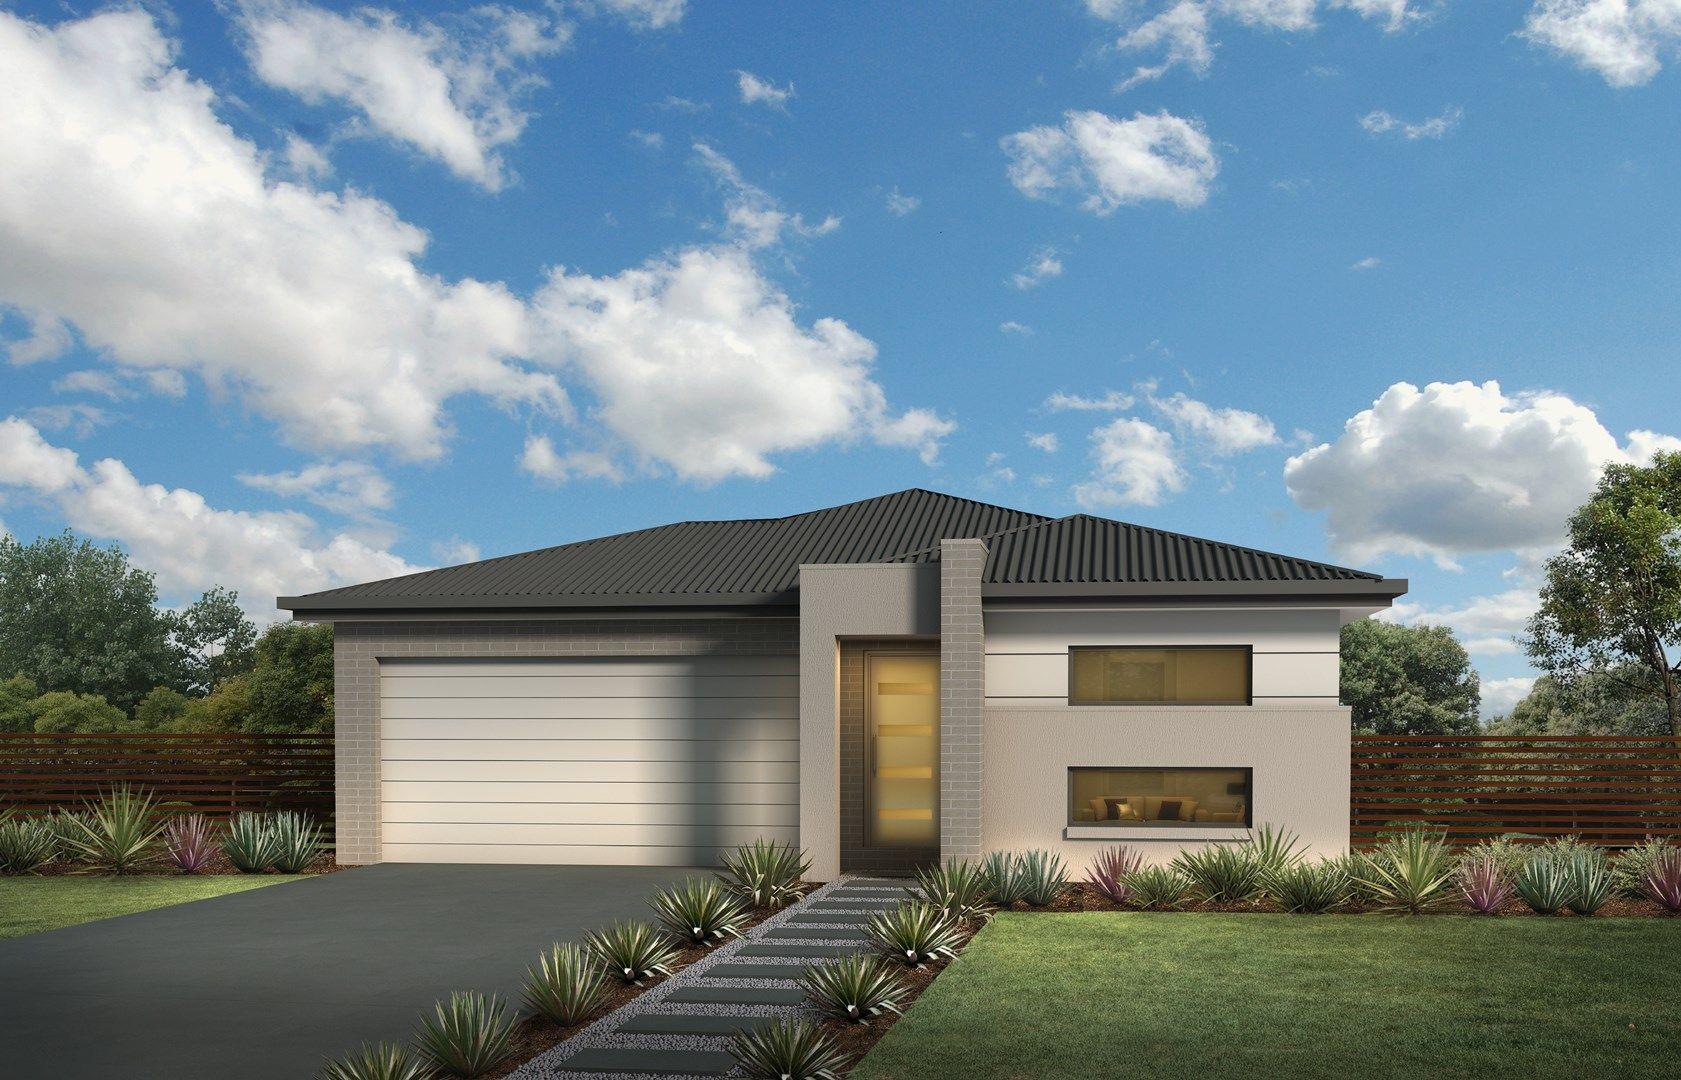 Lot 14 Gilmour Terrace, Kalbar QLD 4309, Image 0